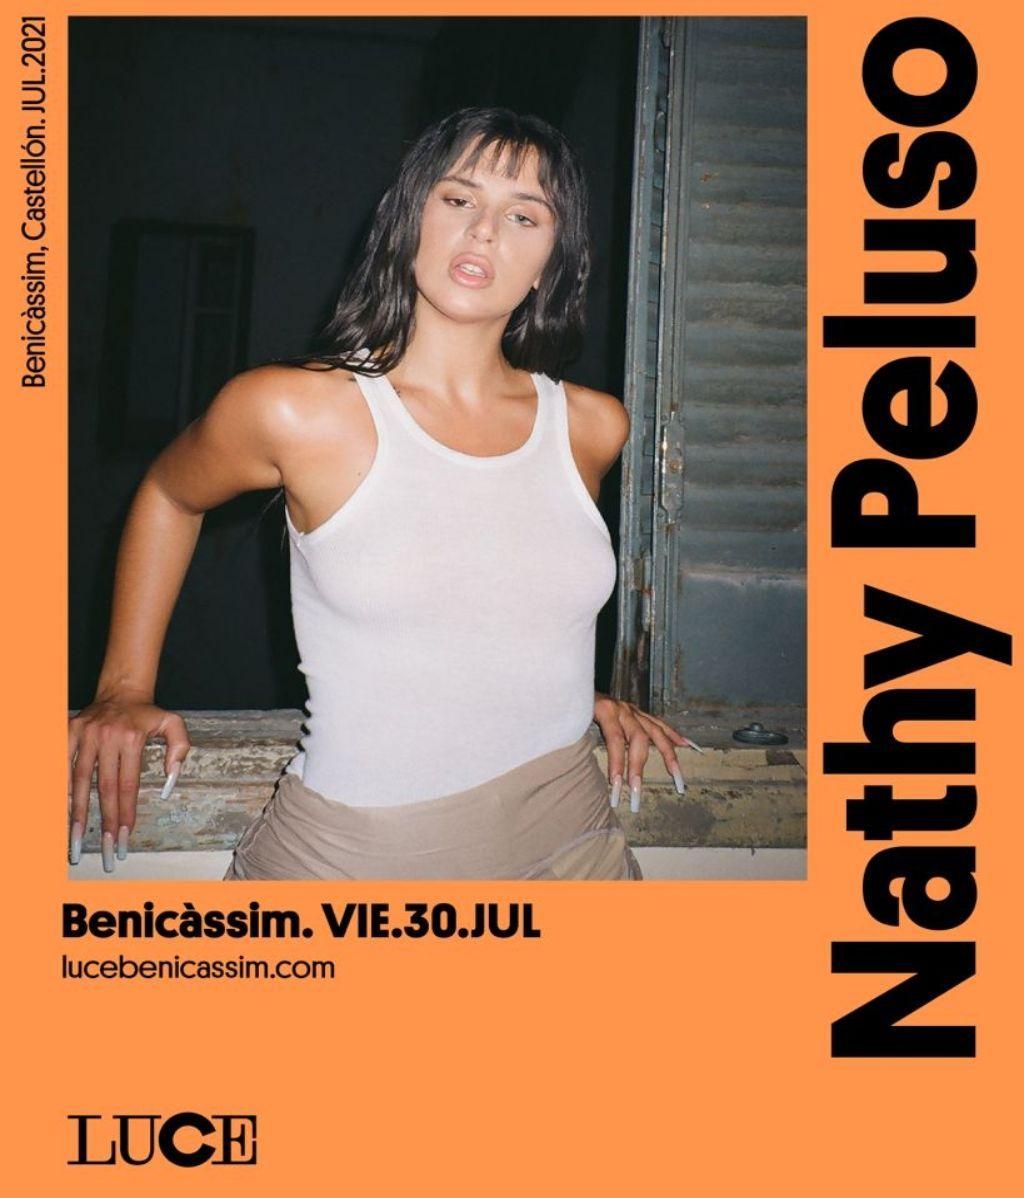 NATHY PELUSO LUCE BENICASSIMv